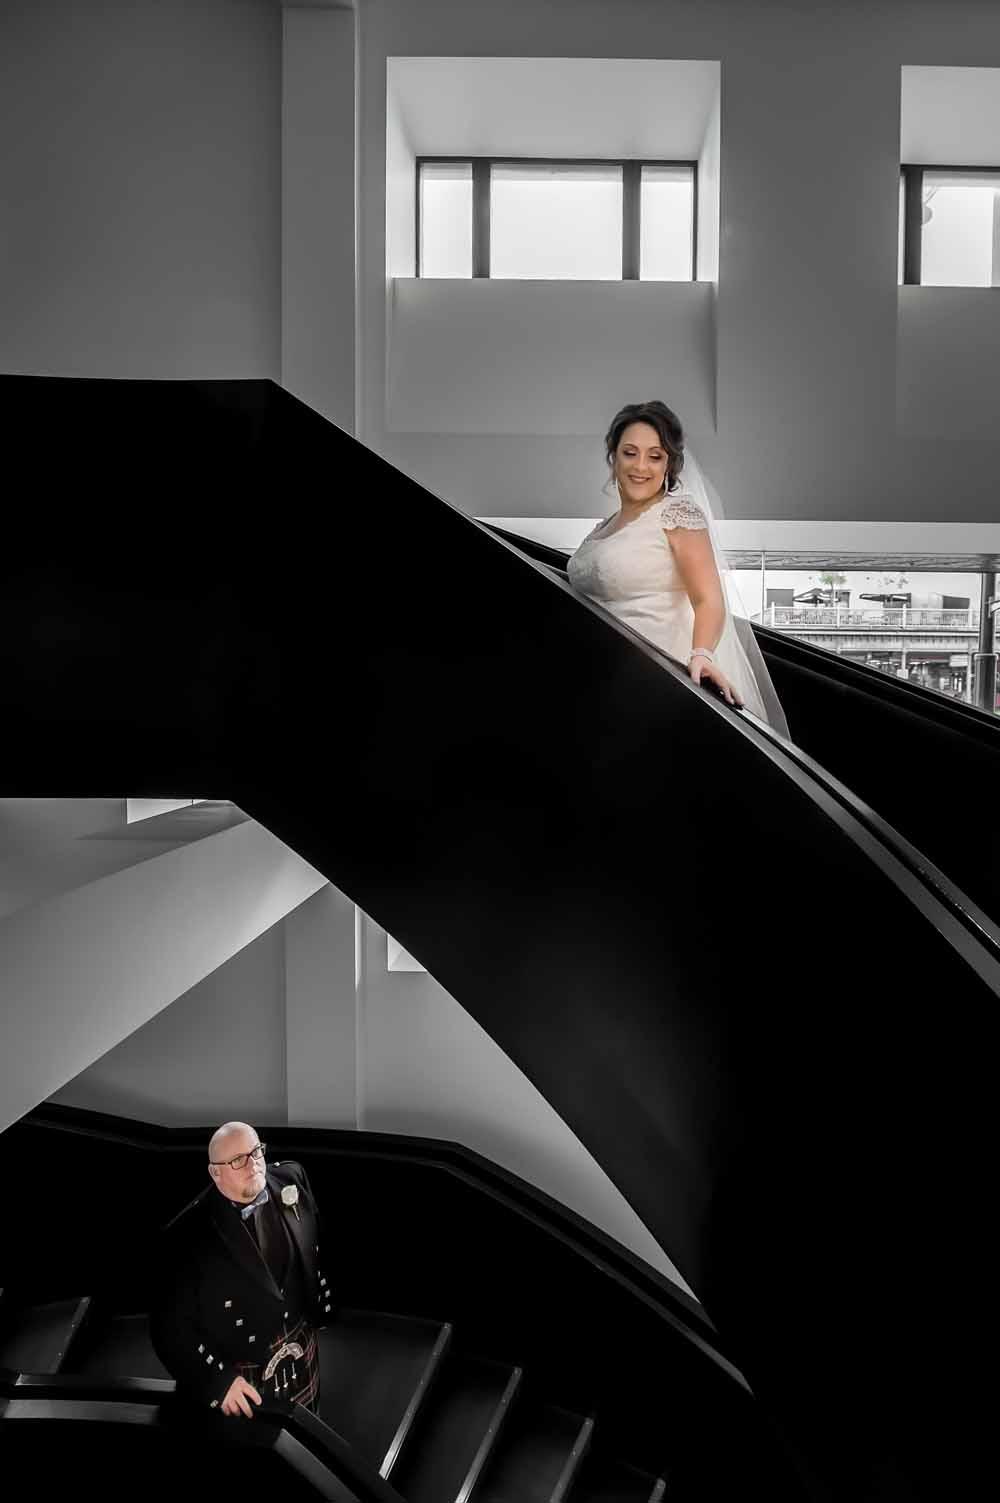 Tony Fu for BCaptured Photography